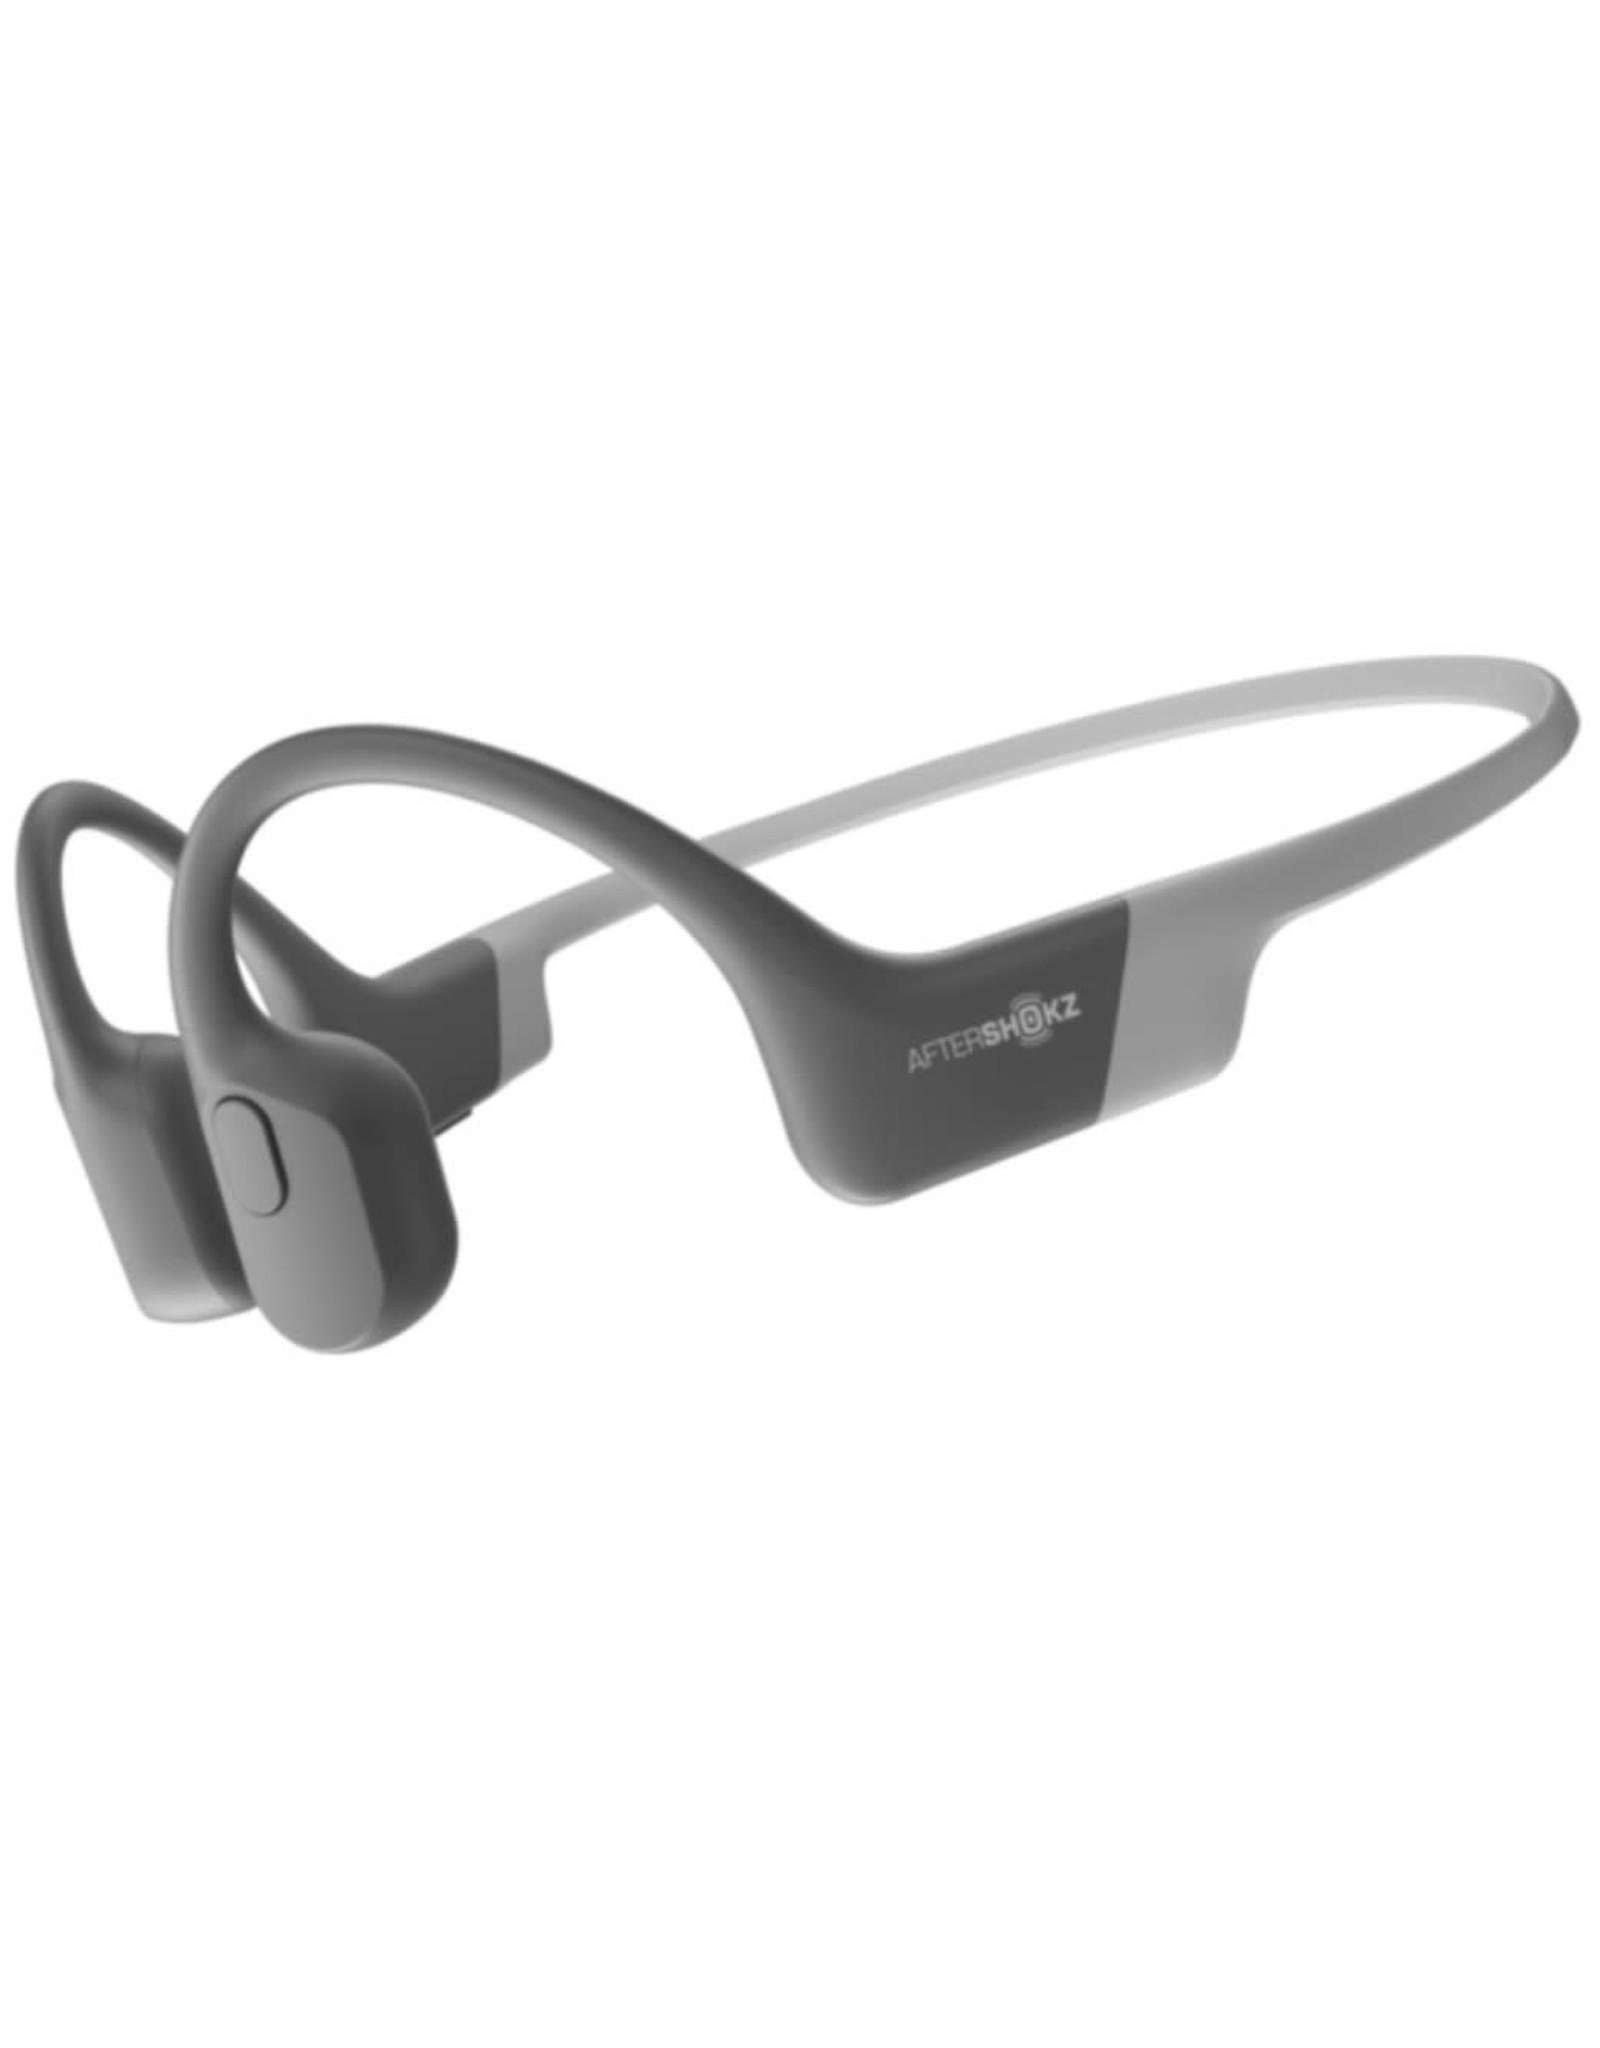 Aftershokz Aftershokz Aeropex Bluetooth Headset IP67 Lunar Grey with Mic